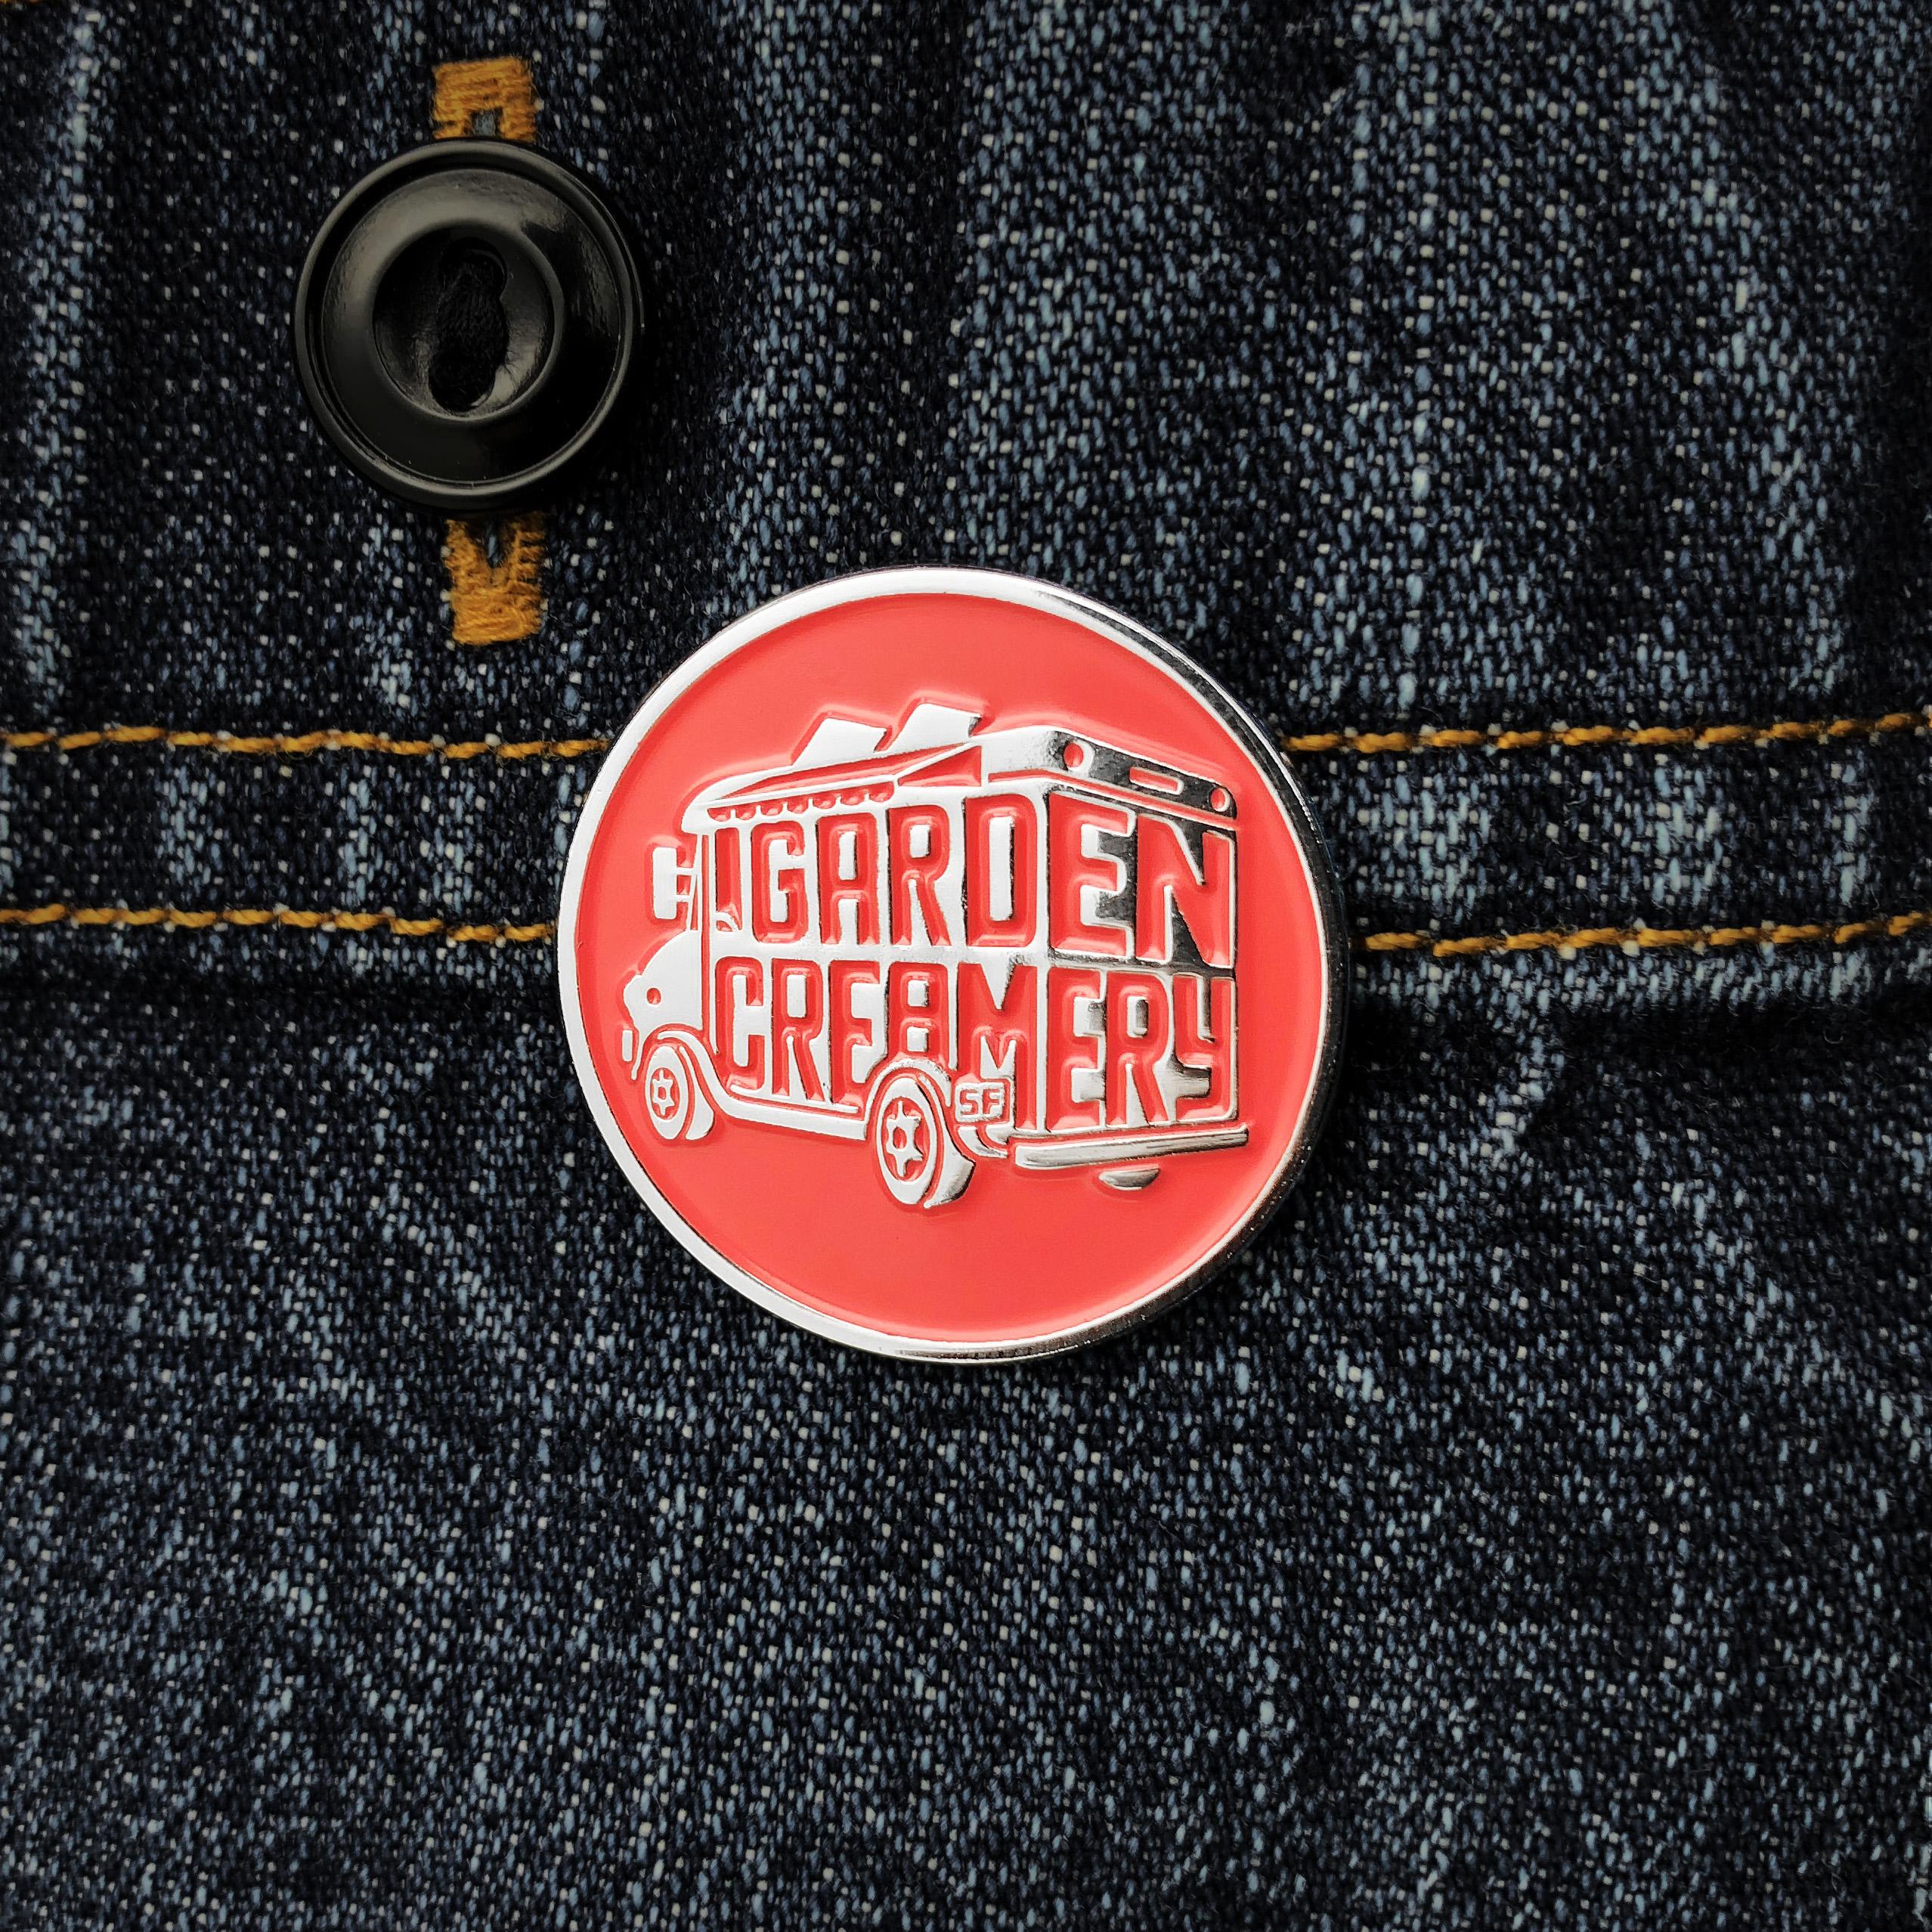 Garden Creamery logo pin on denim jacket